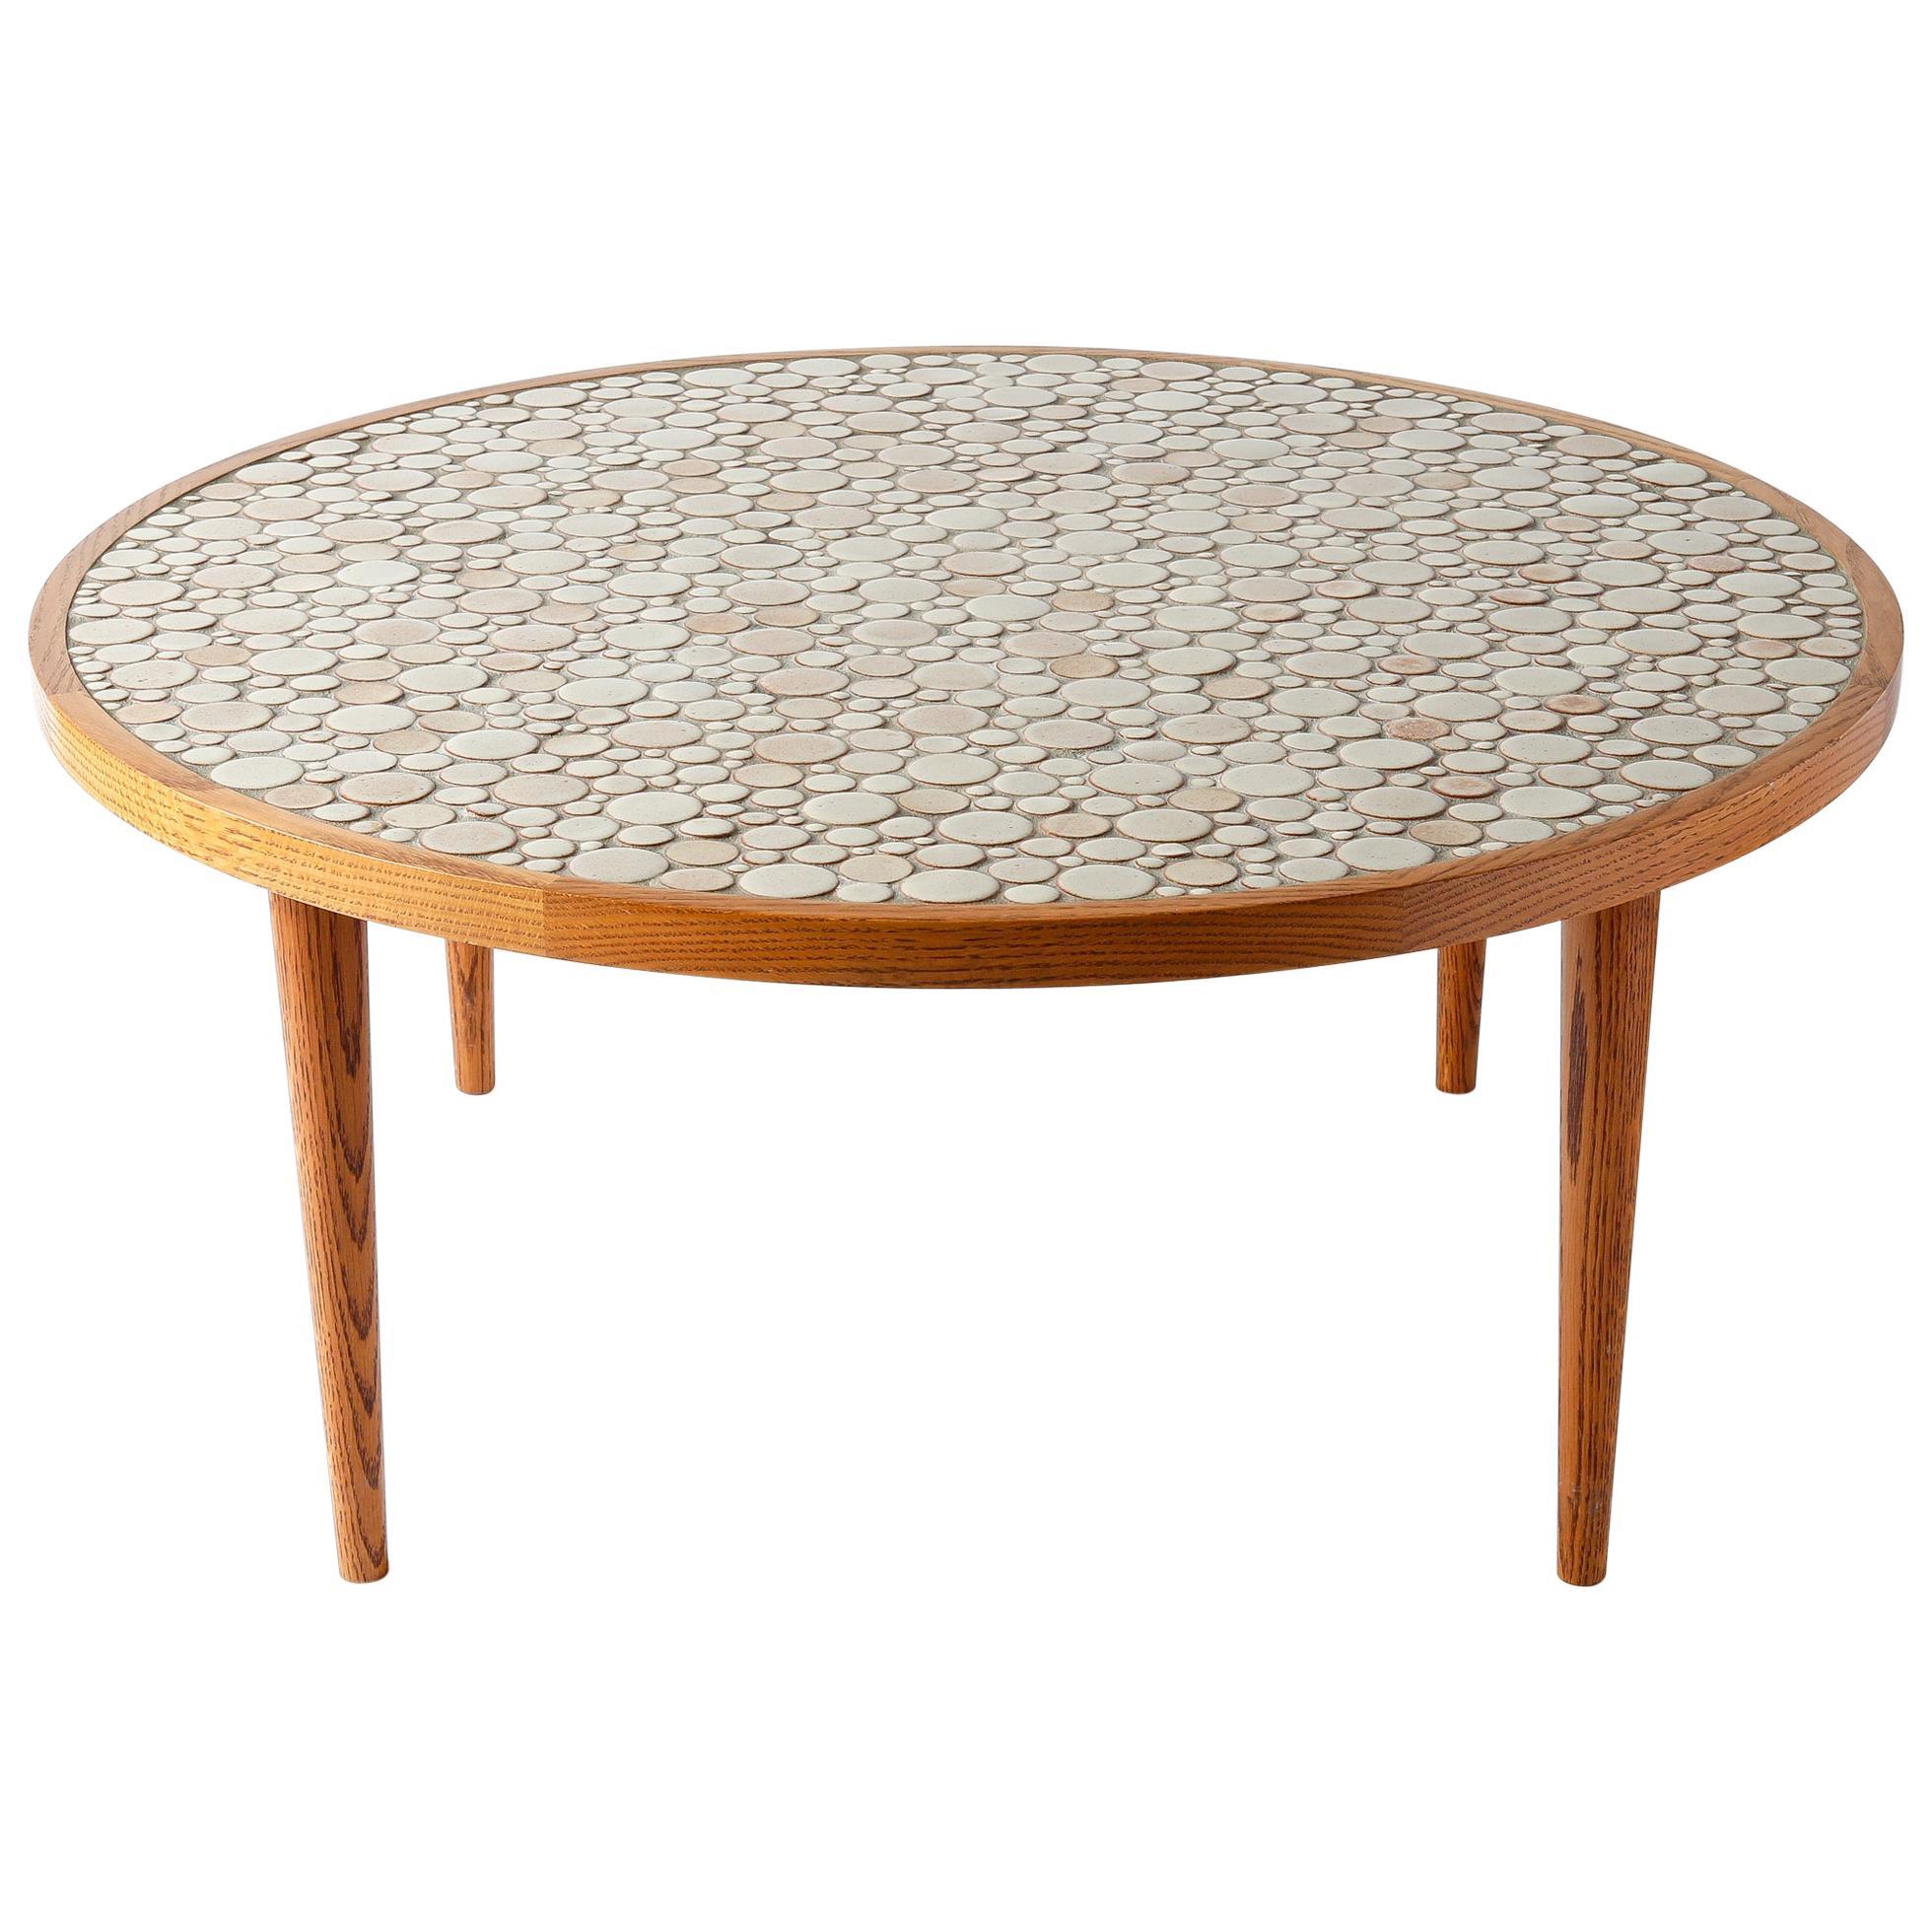 Magnificent Martz Ceramic Tile Top Oak Coffee Table Tan Circles Marshall Studios Machost Co Dining Chair Design Ideas Machostcouk